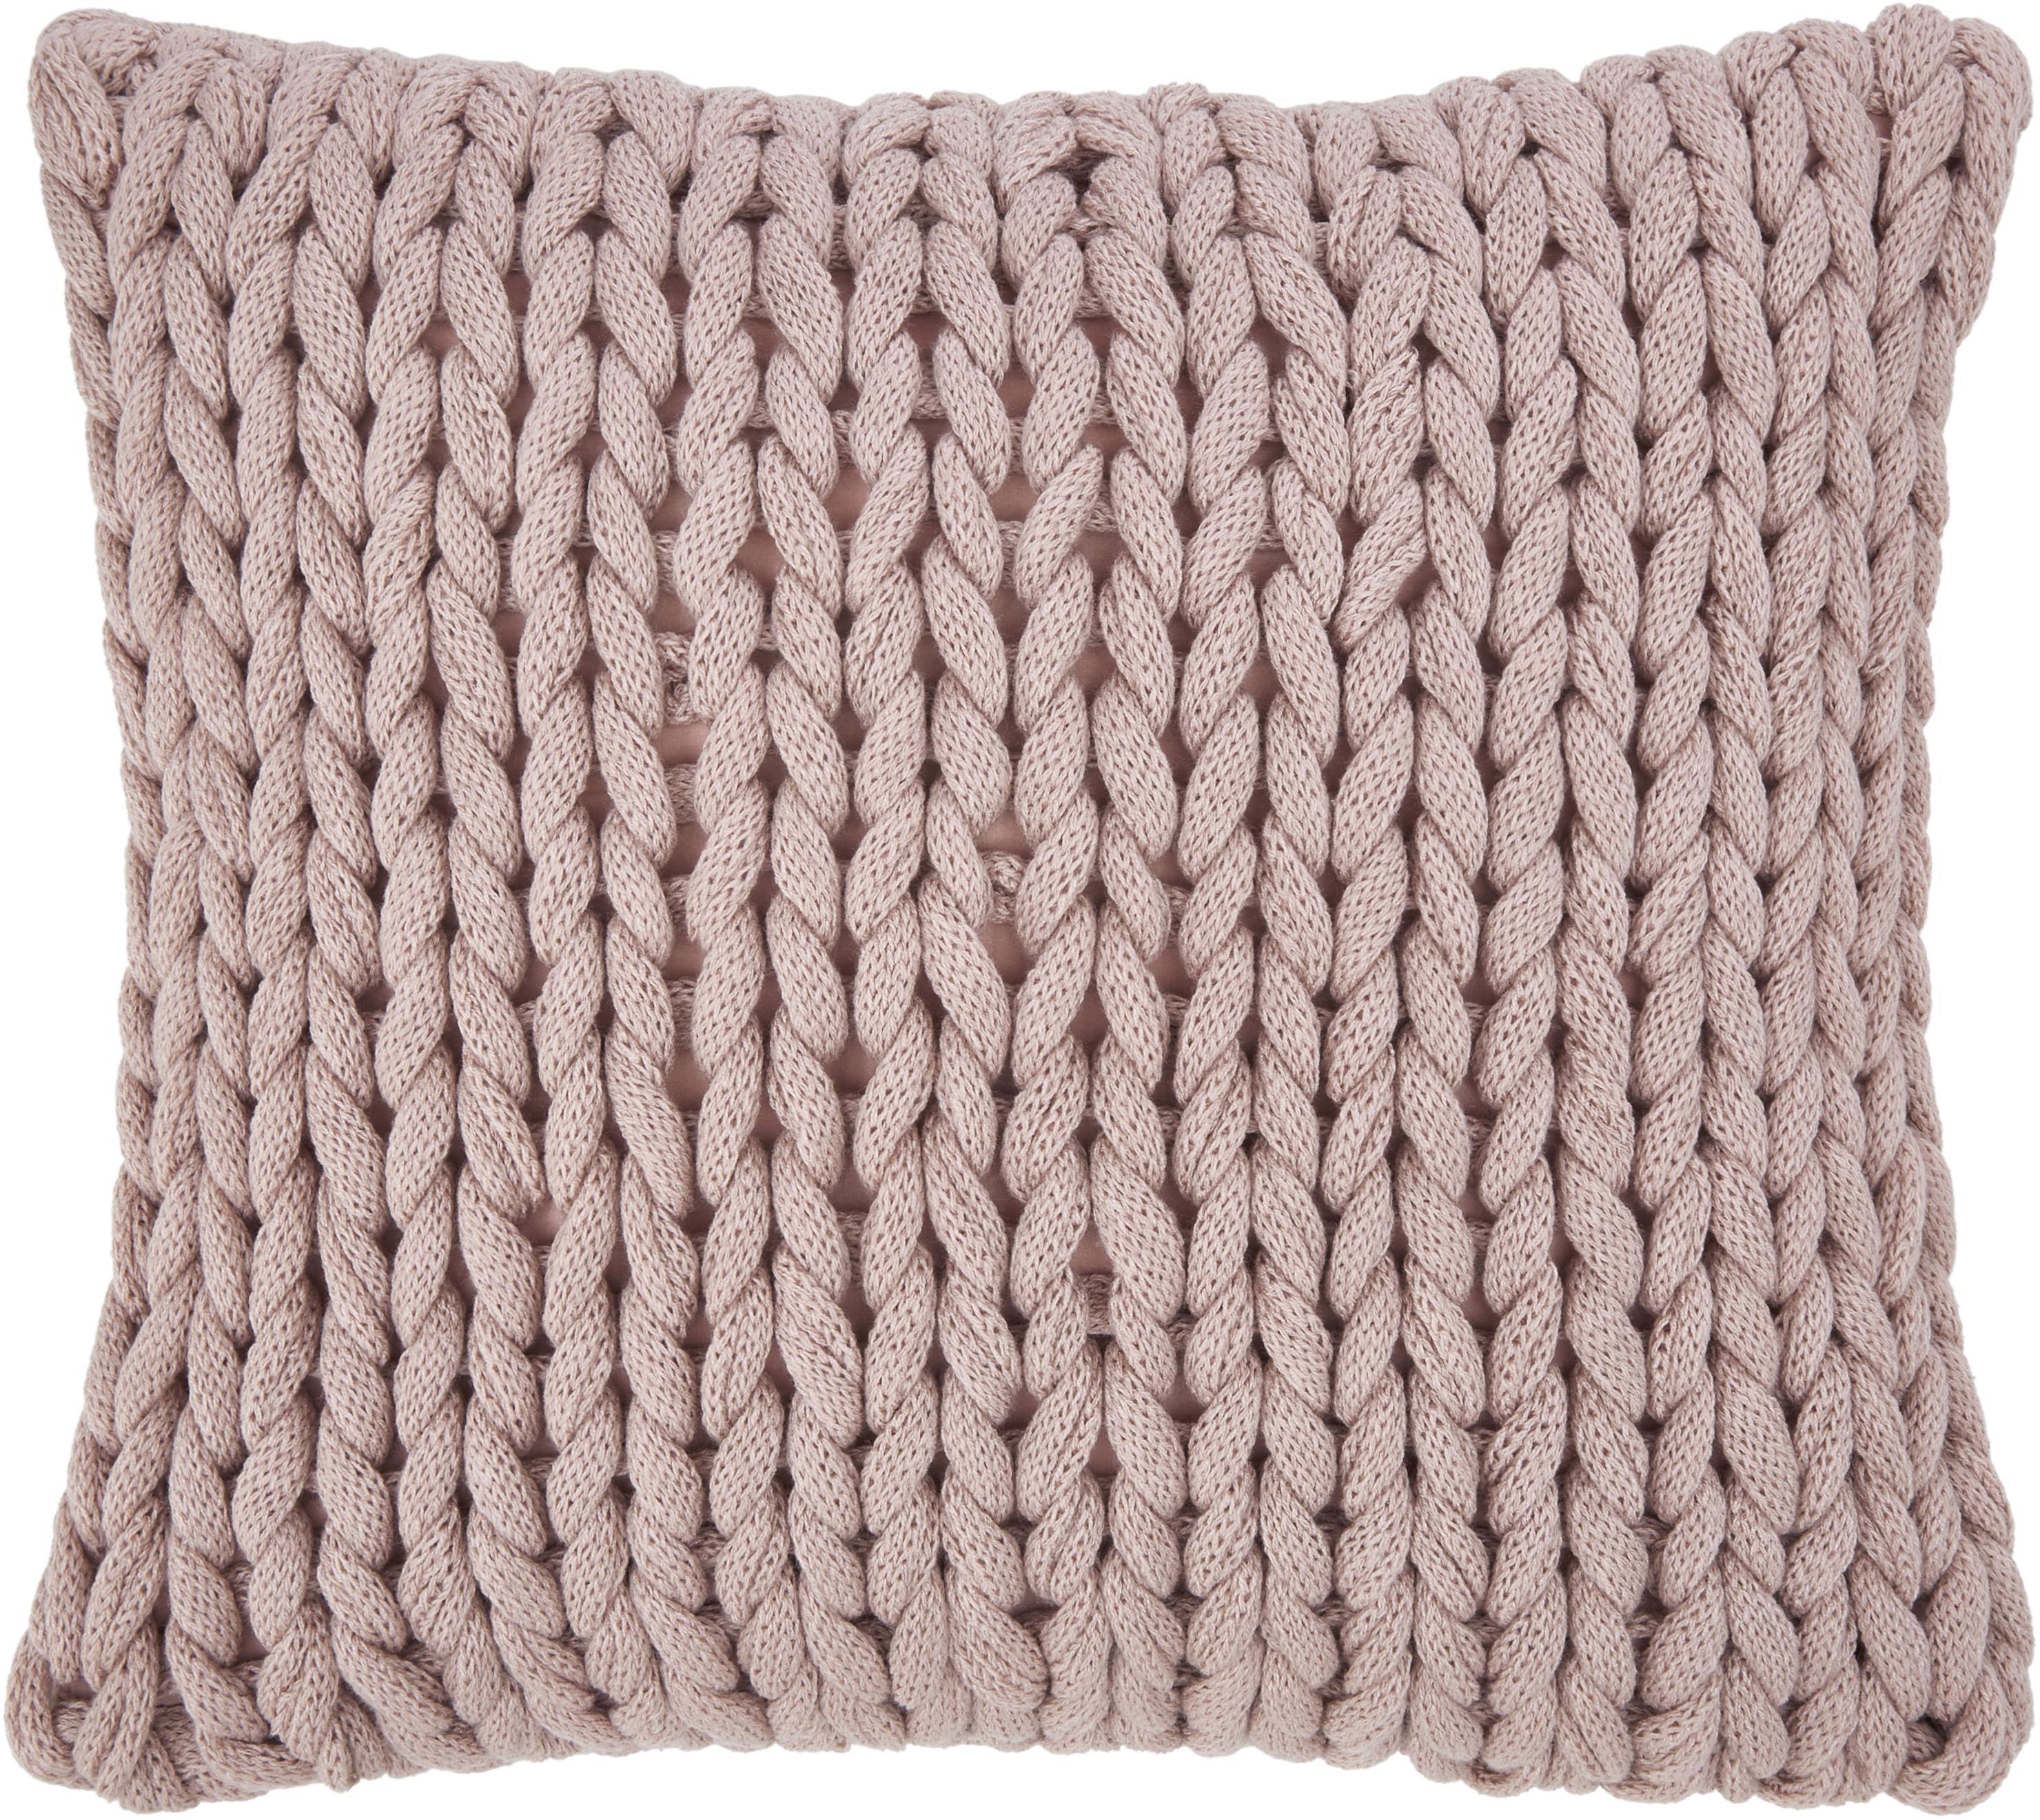 Plaid a maglia grossa rosa cipria Adyna, 100% poliacrilico, Rosa cipria, Larg. 45 x Lung. 45 cm